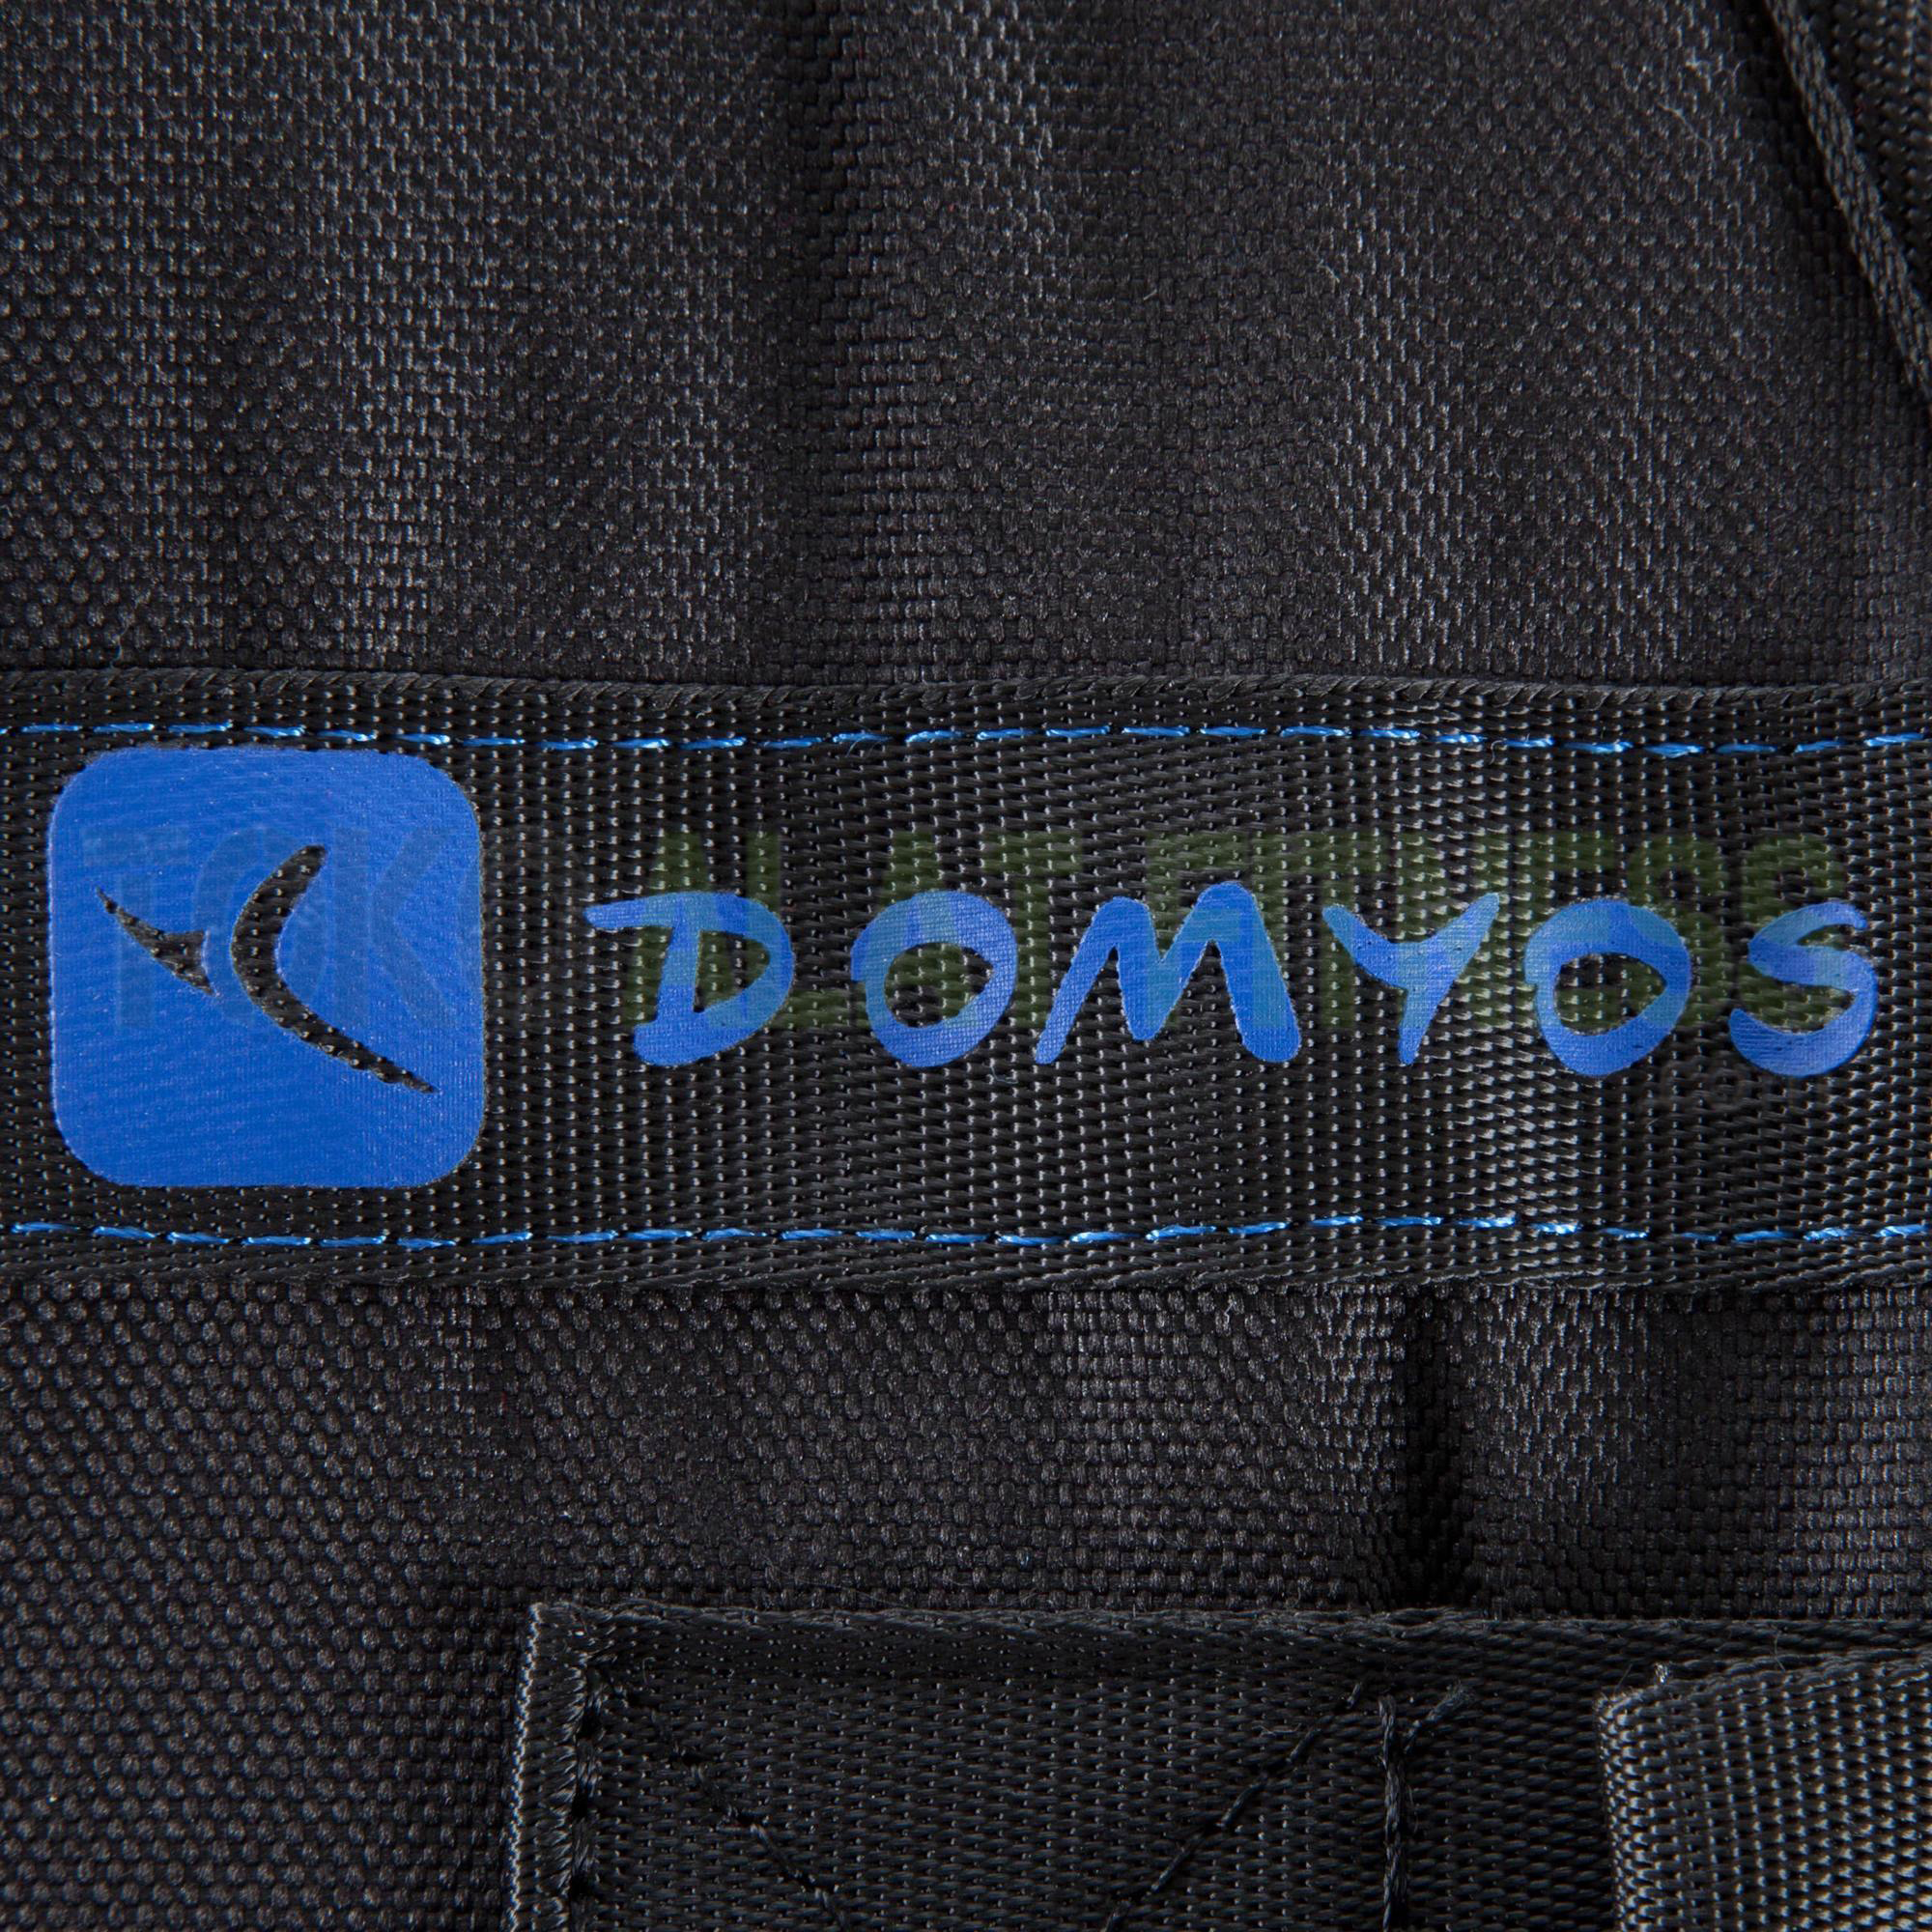 rompi pemberat domyos wtm 5 - Weight Vest/Rompi Pemberat 10kg Domyos - ASSAW39